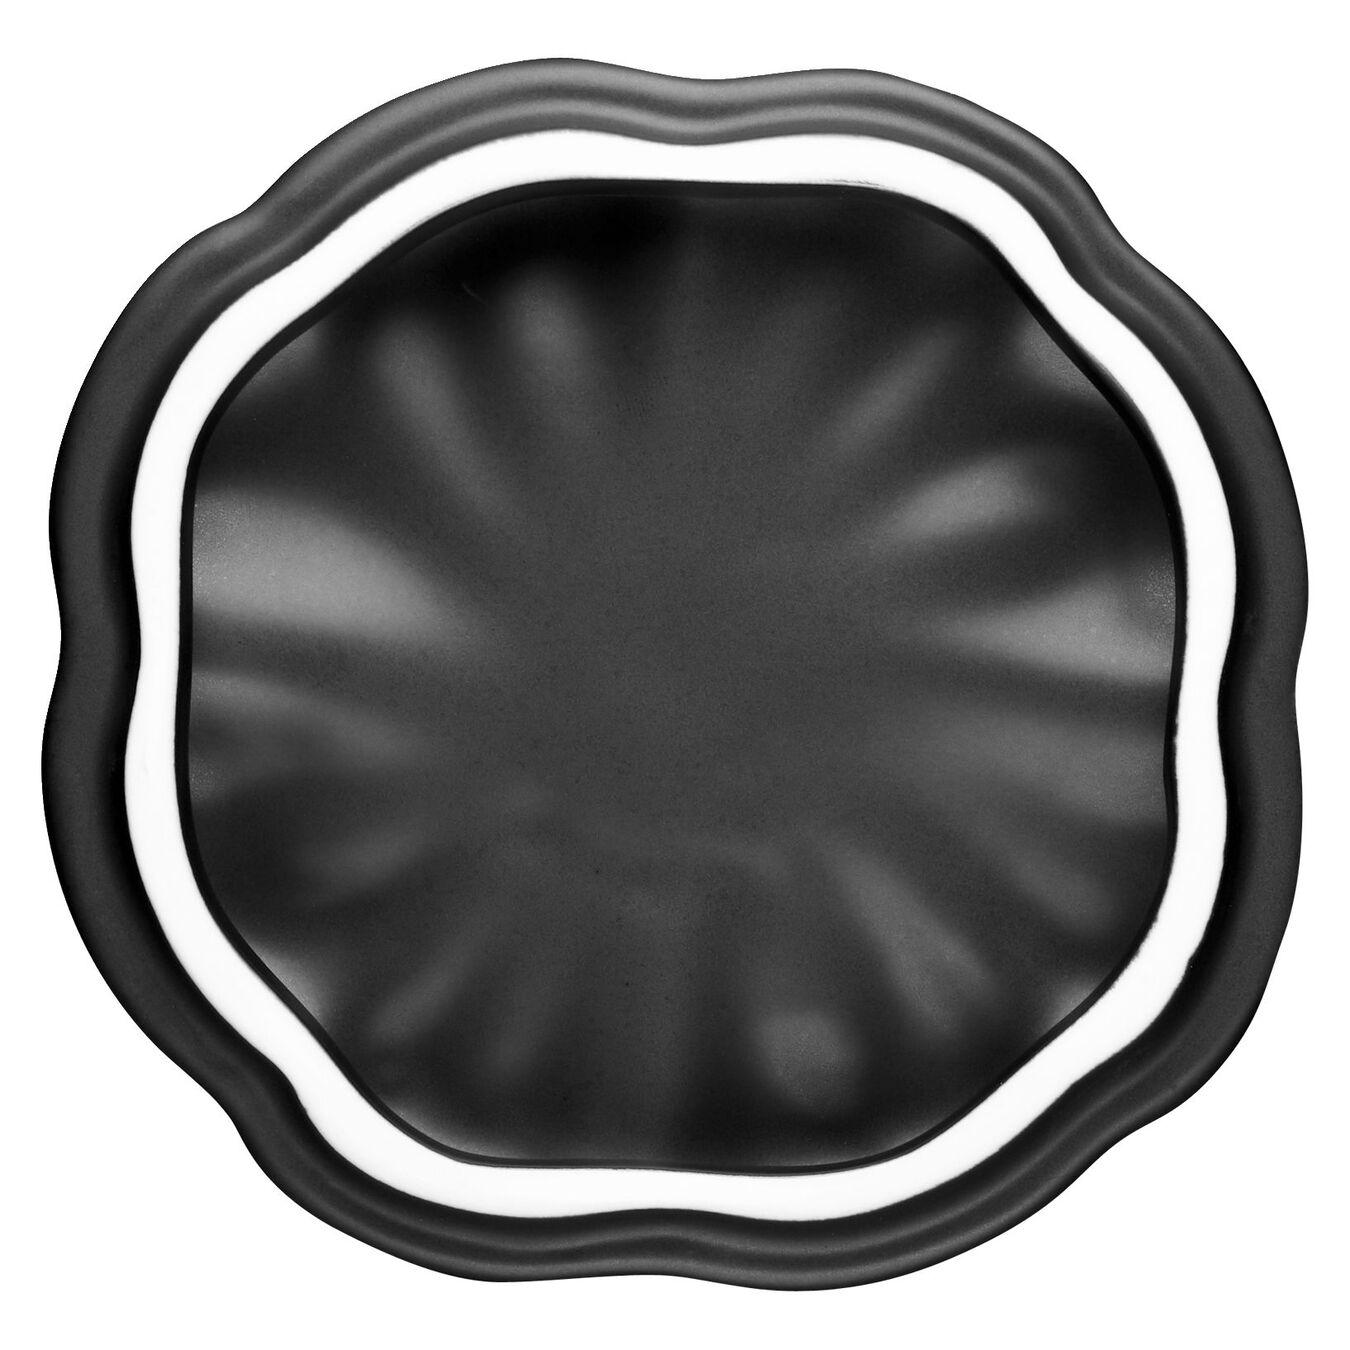 500 ml Ceramic pumpkin Cocotte, Black,,large 2